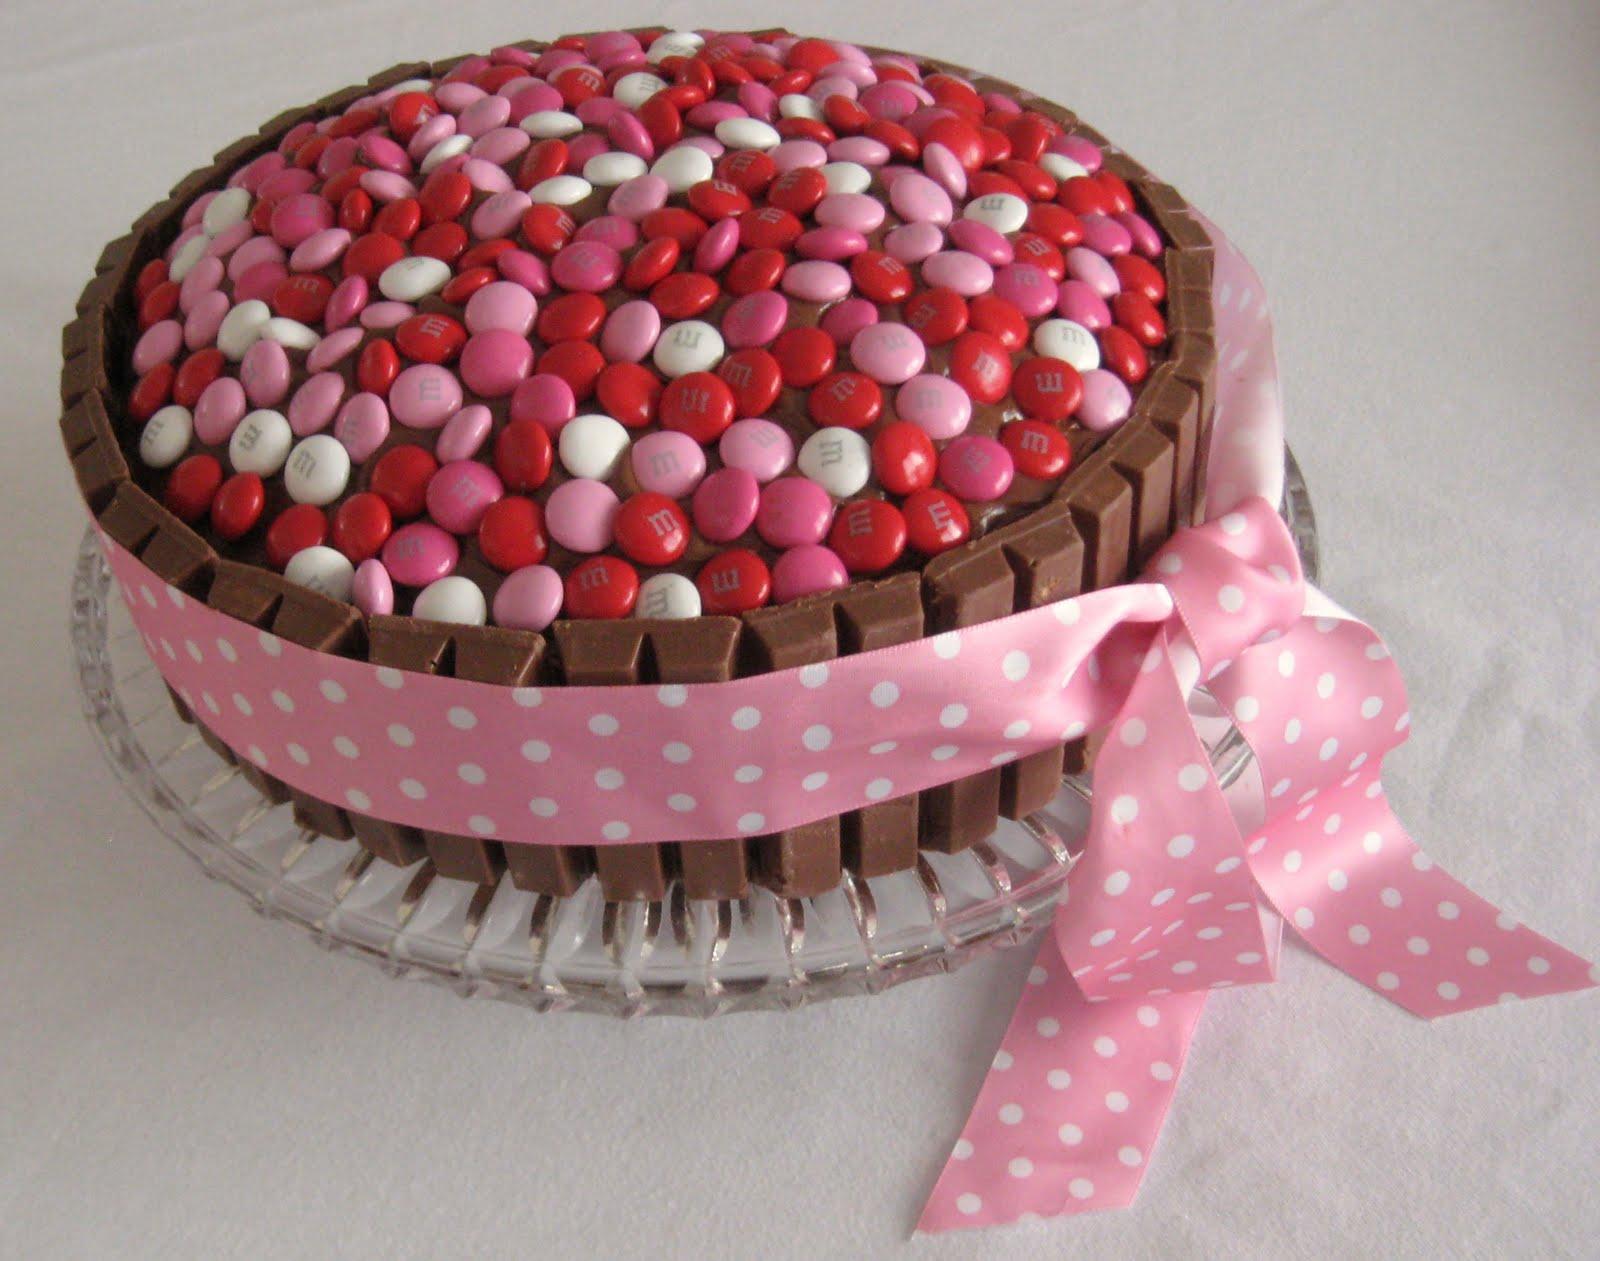 Valentine's Day Cake Decorating Ideas